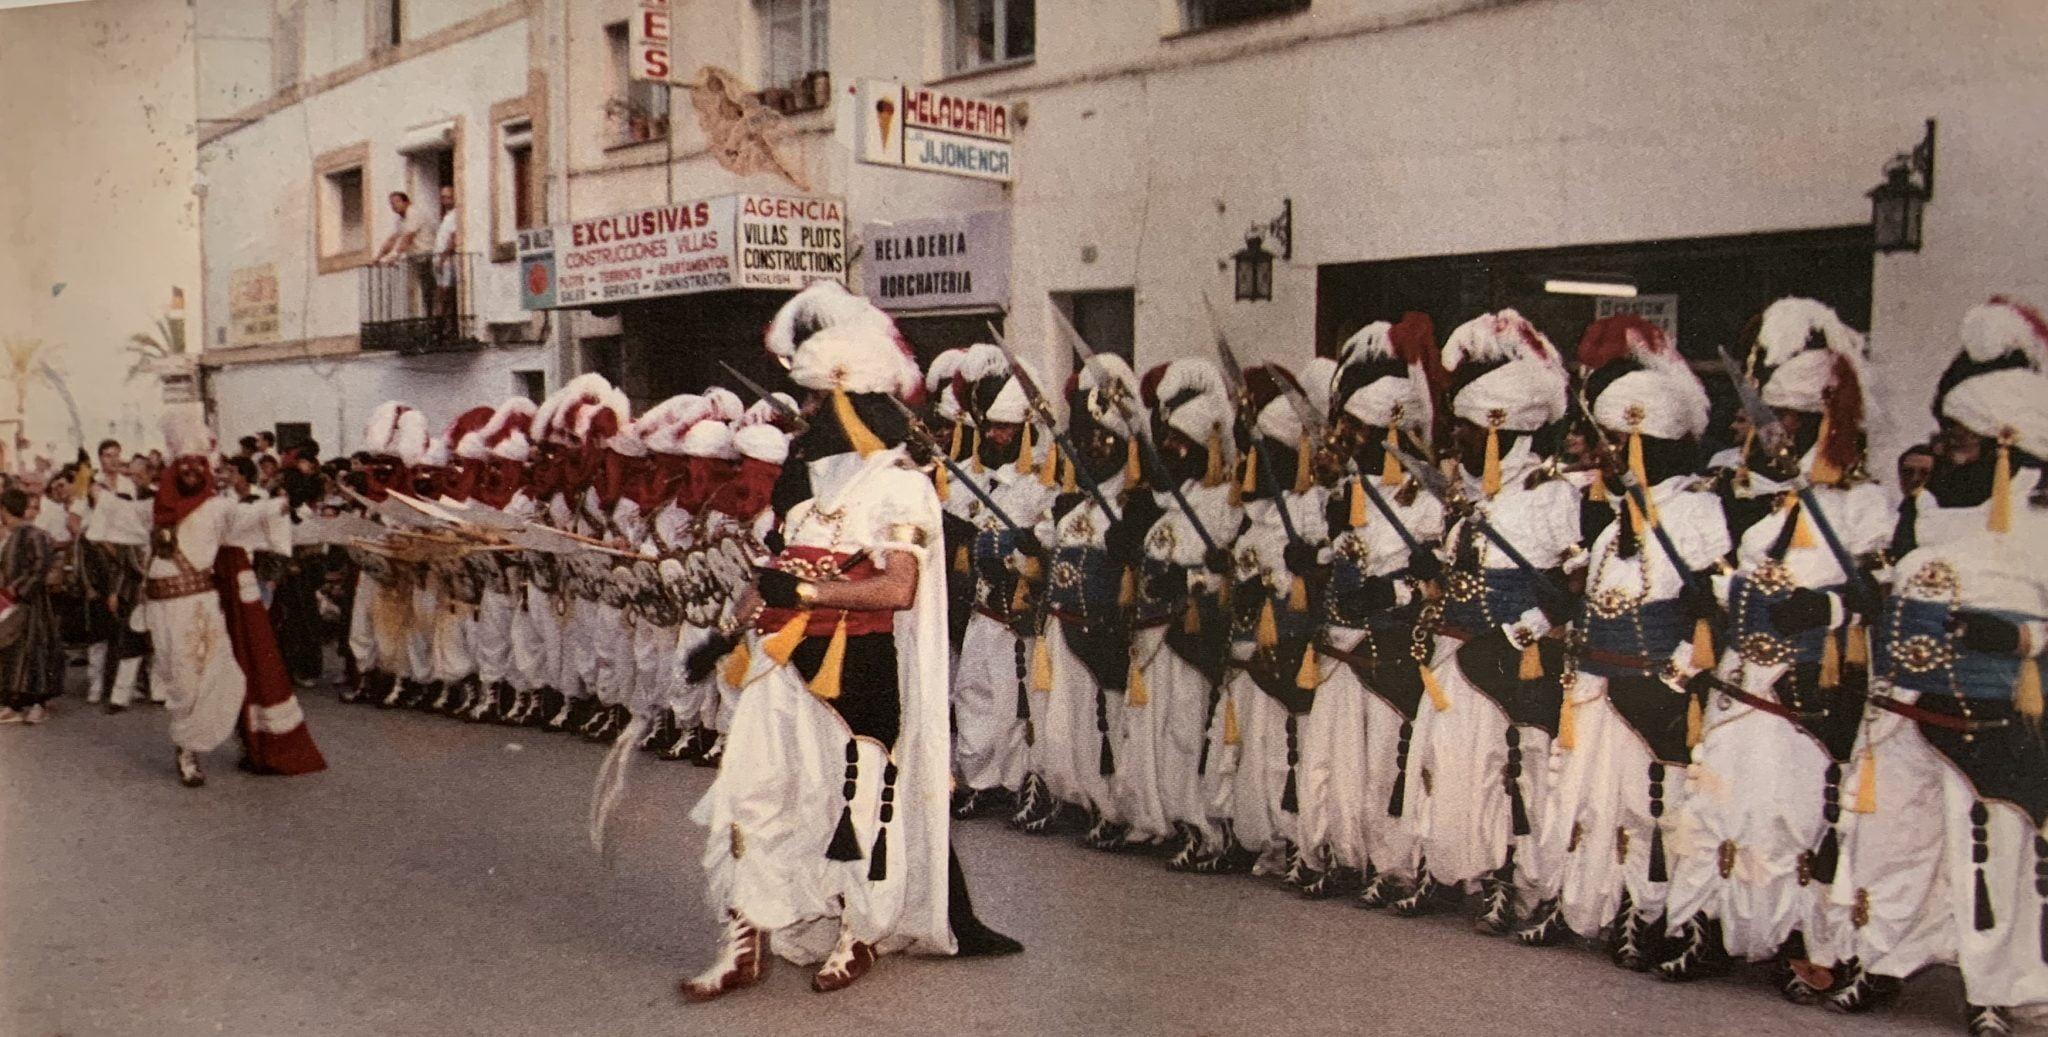 Las dos escuadras de la Filà Almoradins en 1983